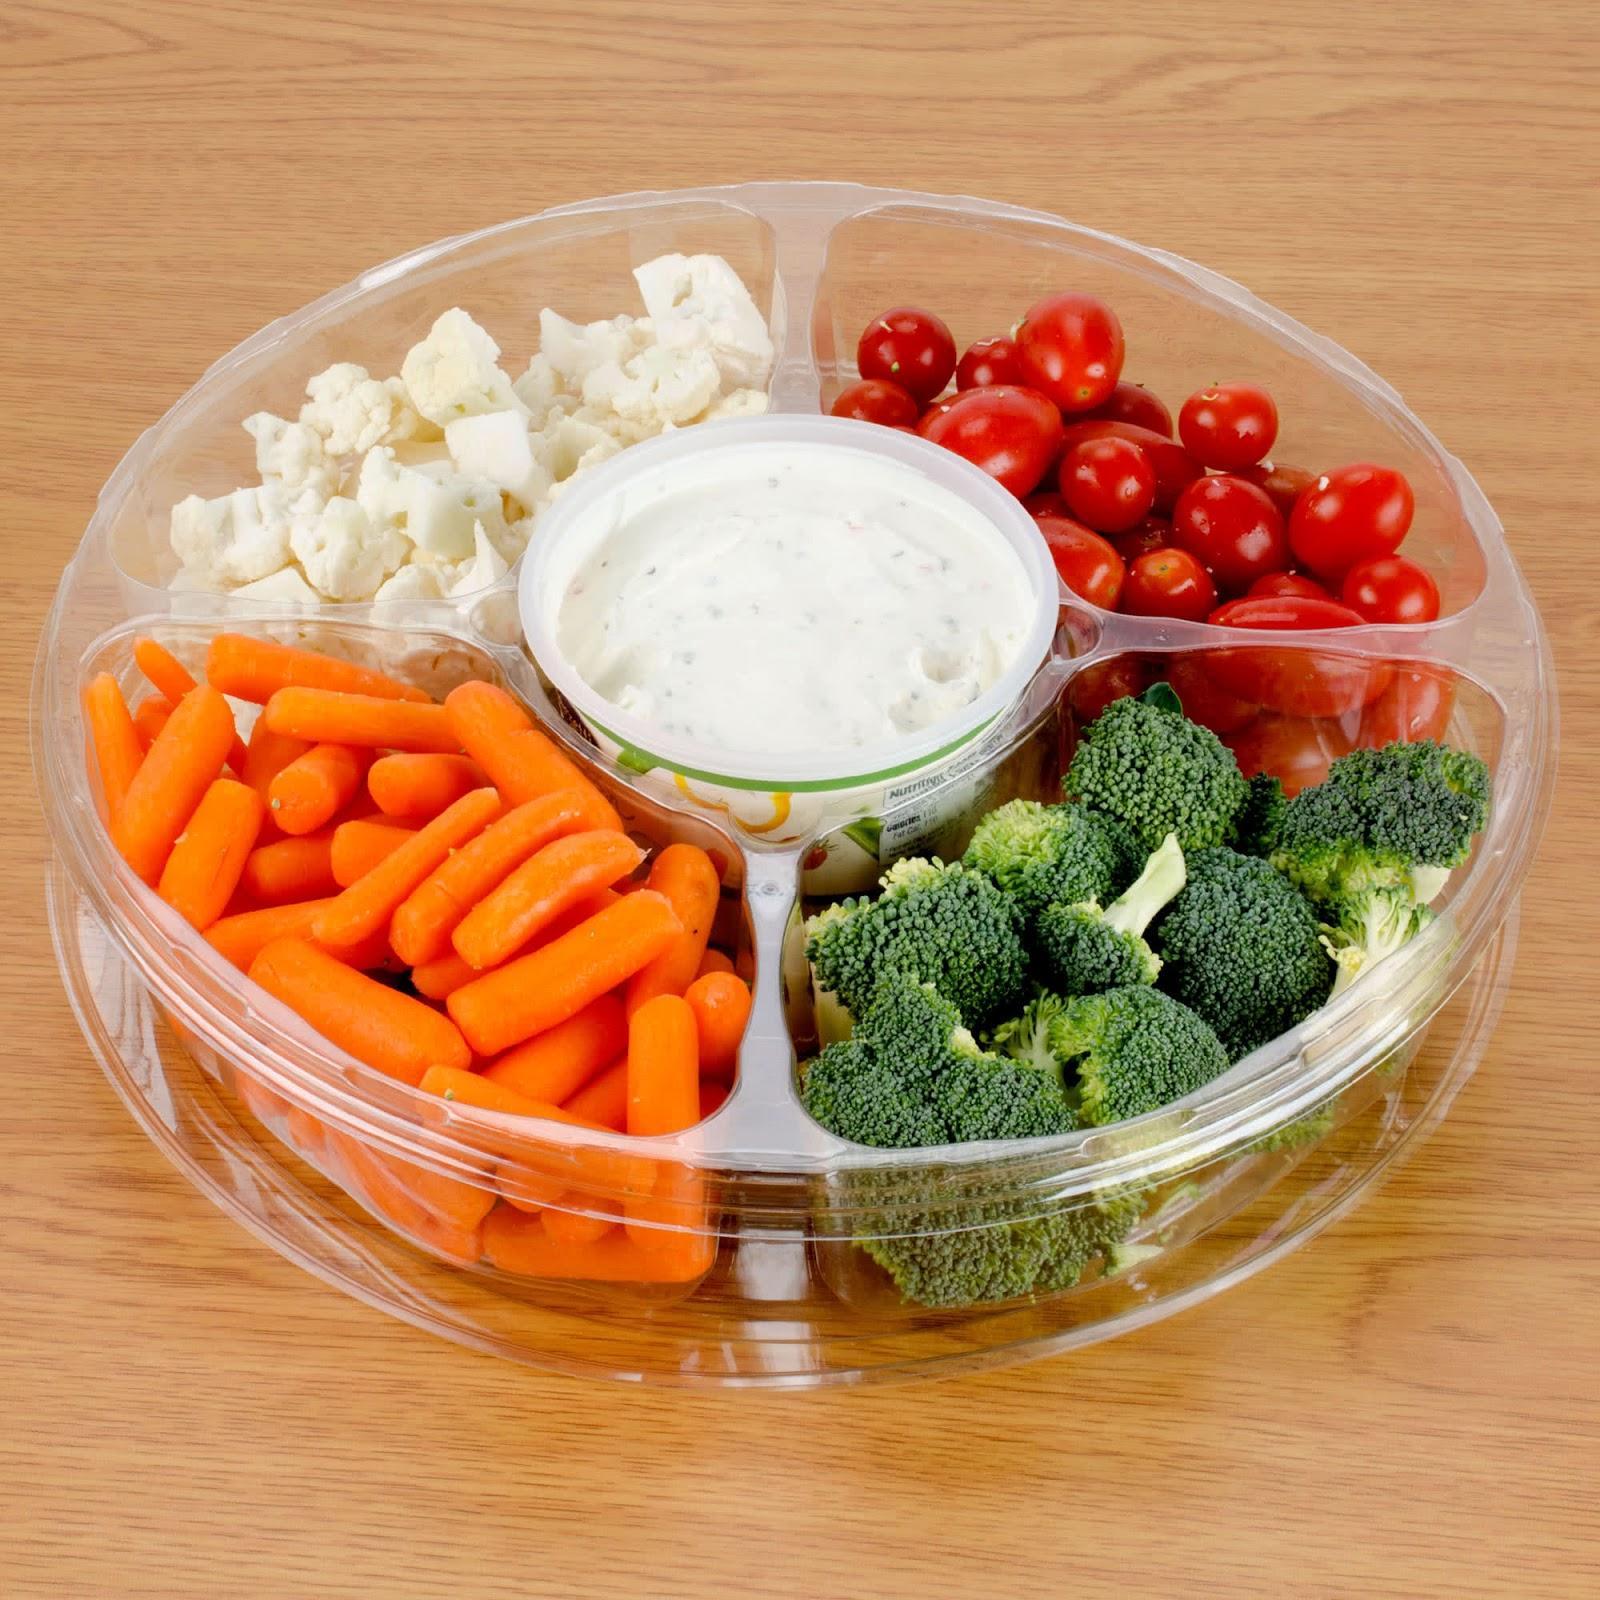 hop dung salad 3